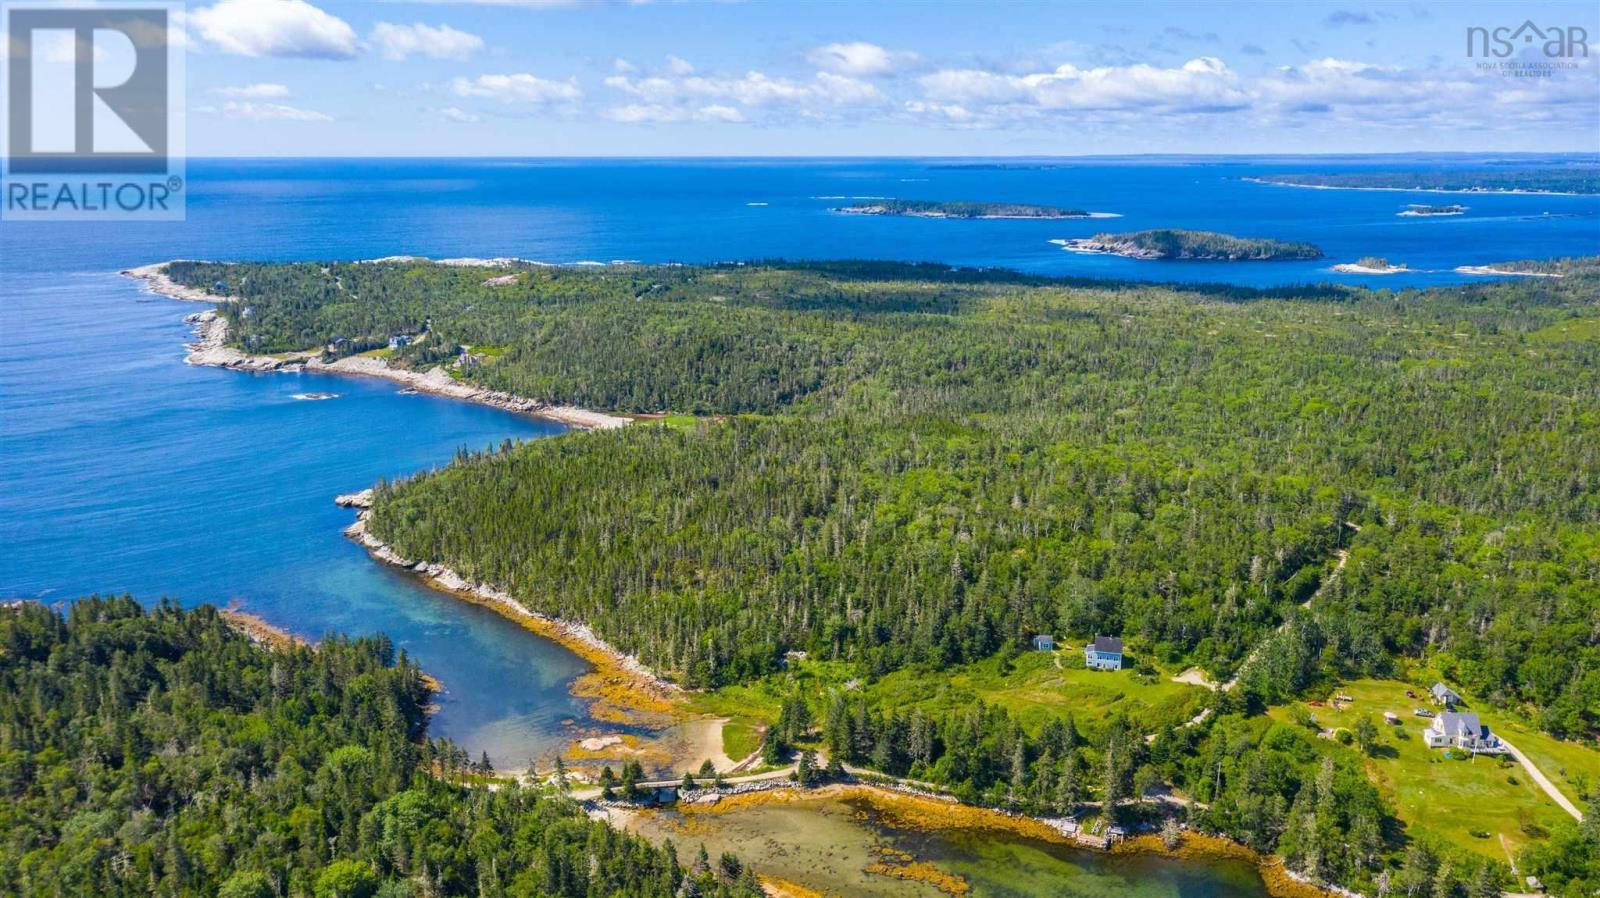 Lot W20-3 Owl's Head Drive, Southwest Cove, Nova Scotia  B0J 1T0 - Photo 15 - 202125696